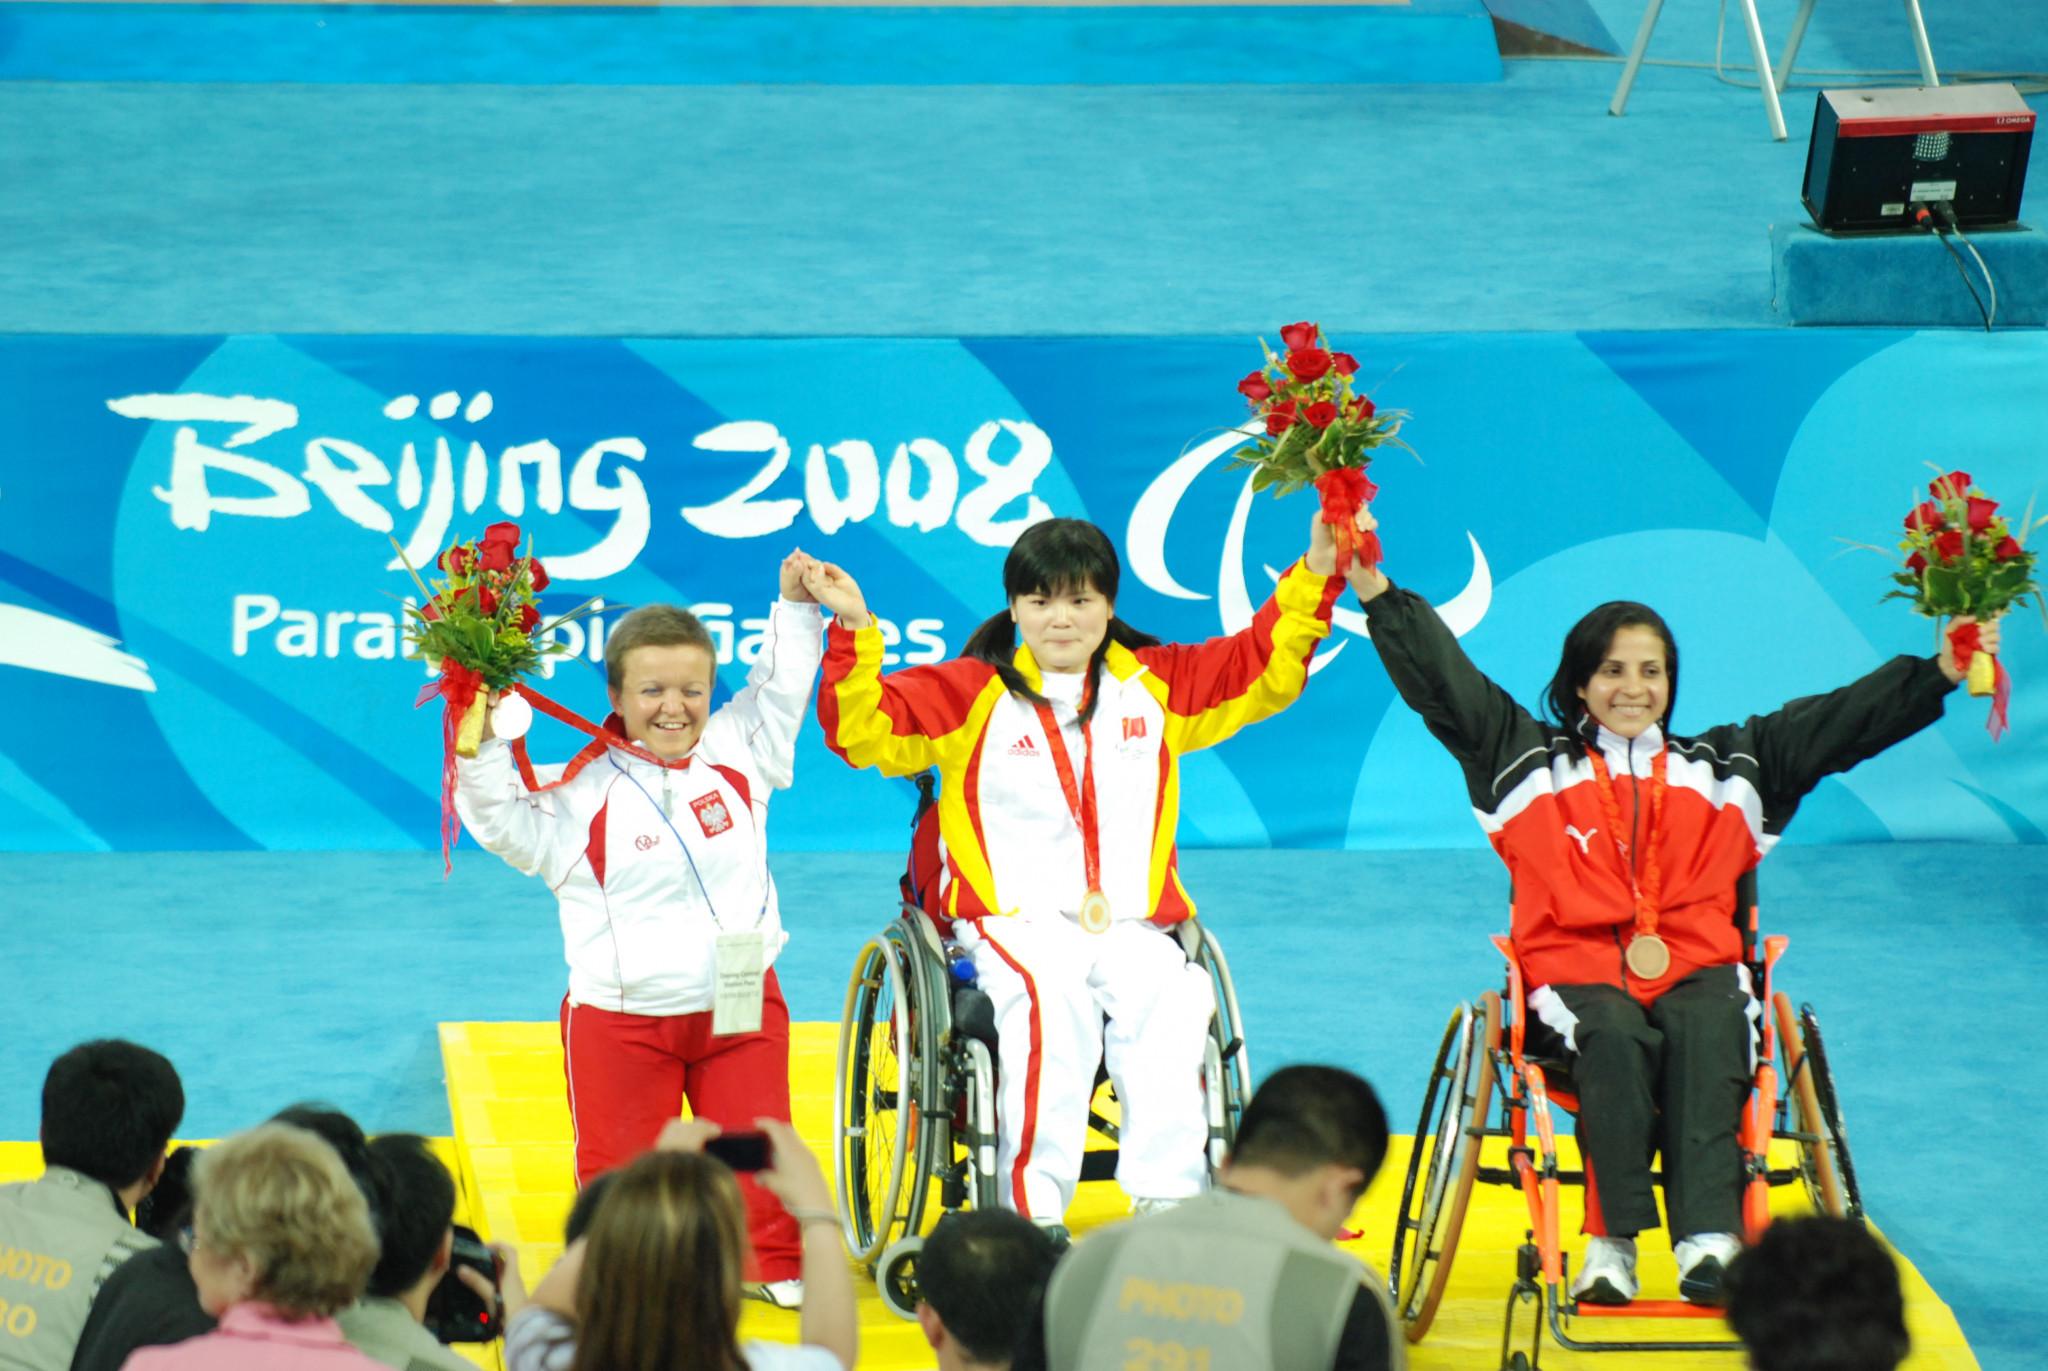 Zeinab Oteify won Paralympic bronze at Beijing 2008 ©Getty Images